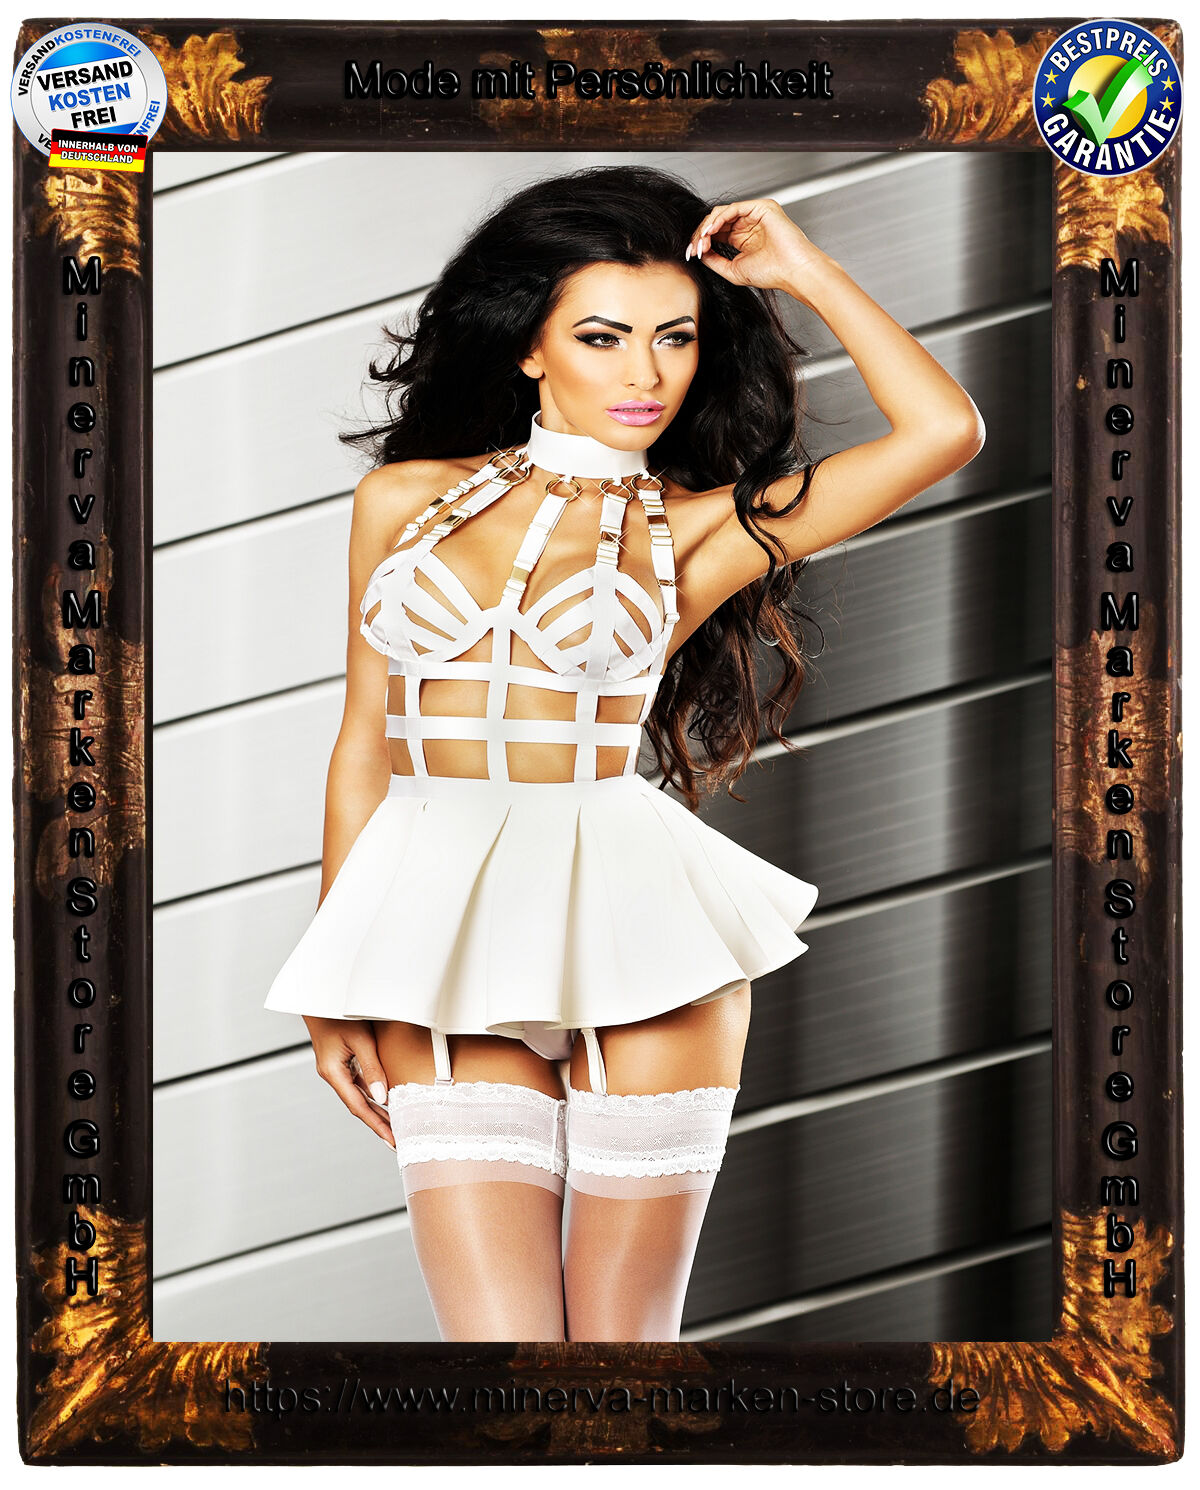 Frivoles weißes Straps-Kleid Lolitta Minikleid Swinger GoGo Strapse Sexy Club